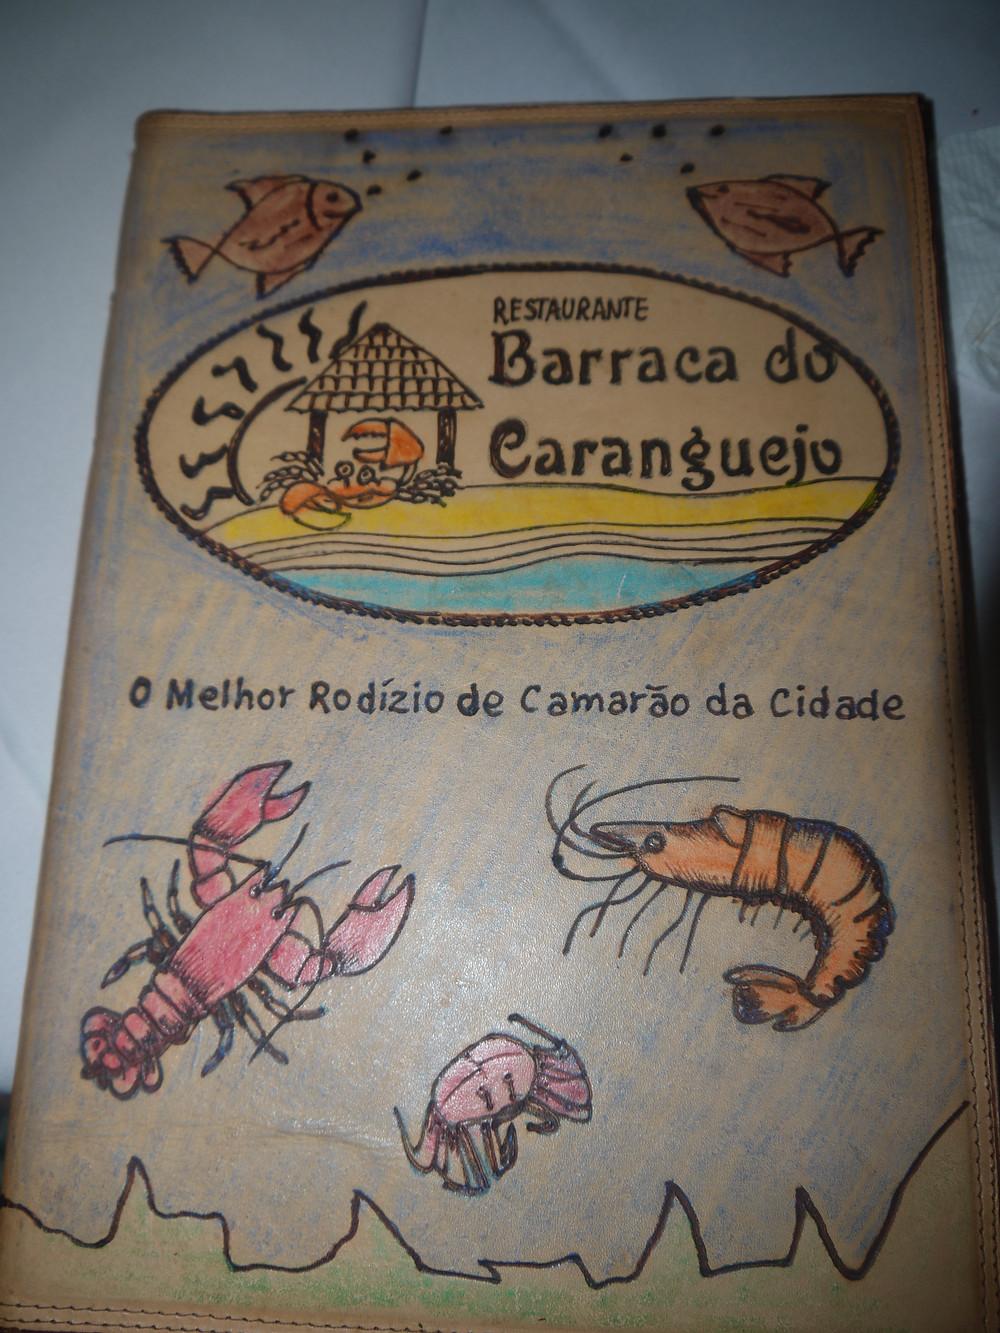 Shrimp Rodízio - all you can eat Brazil